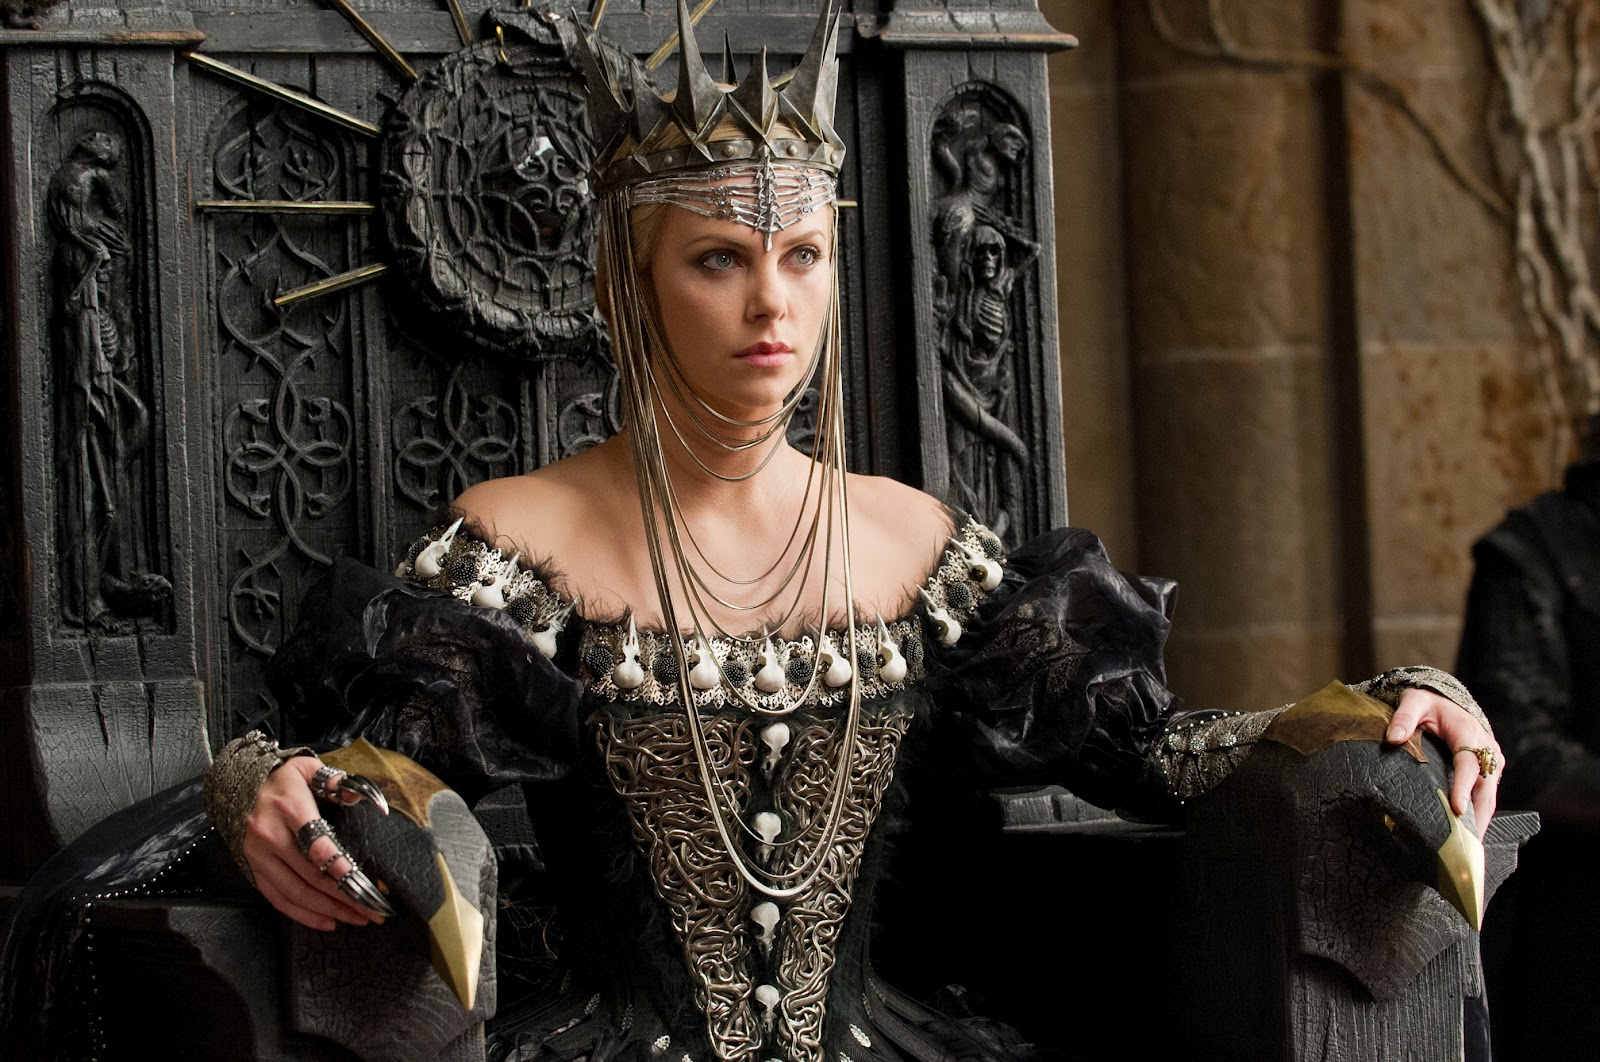 http://3.bp.blogspot.com/-9nBFDOaPKKQ/T9BUd5IpXnI/AAAAAAAAW5I/skKmK_EuYtk/s1600/2410_TP2F_00045R_charlize_theron_close_up_i\'m_the_queen_3.jpg